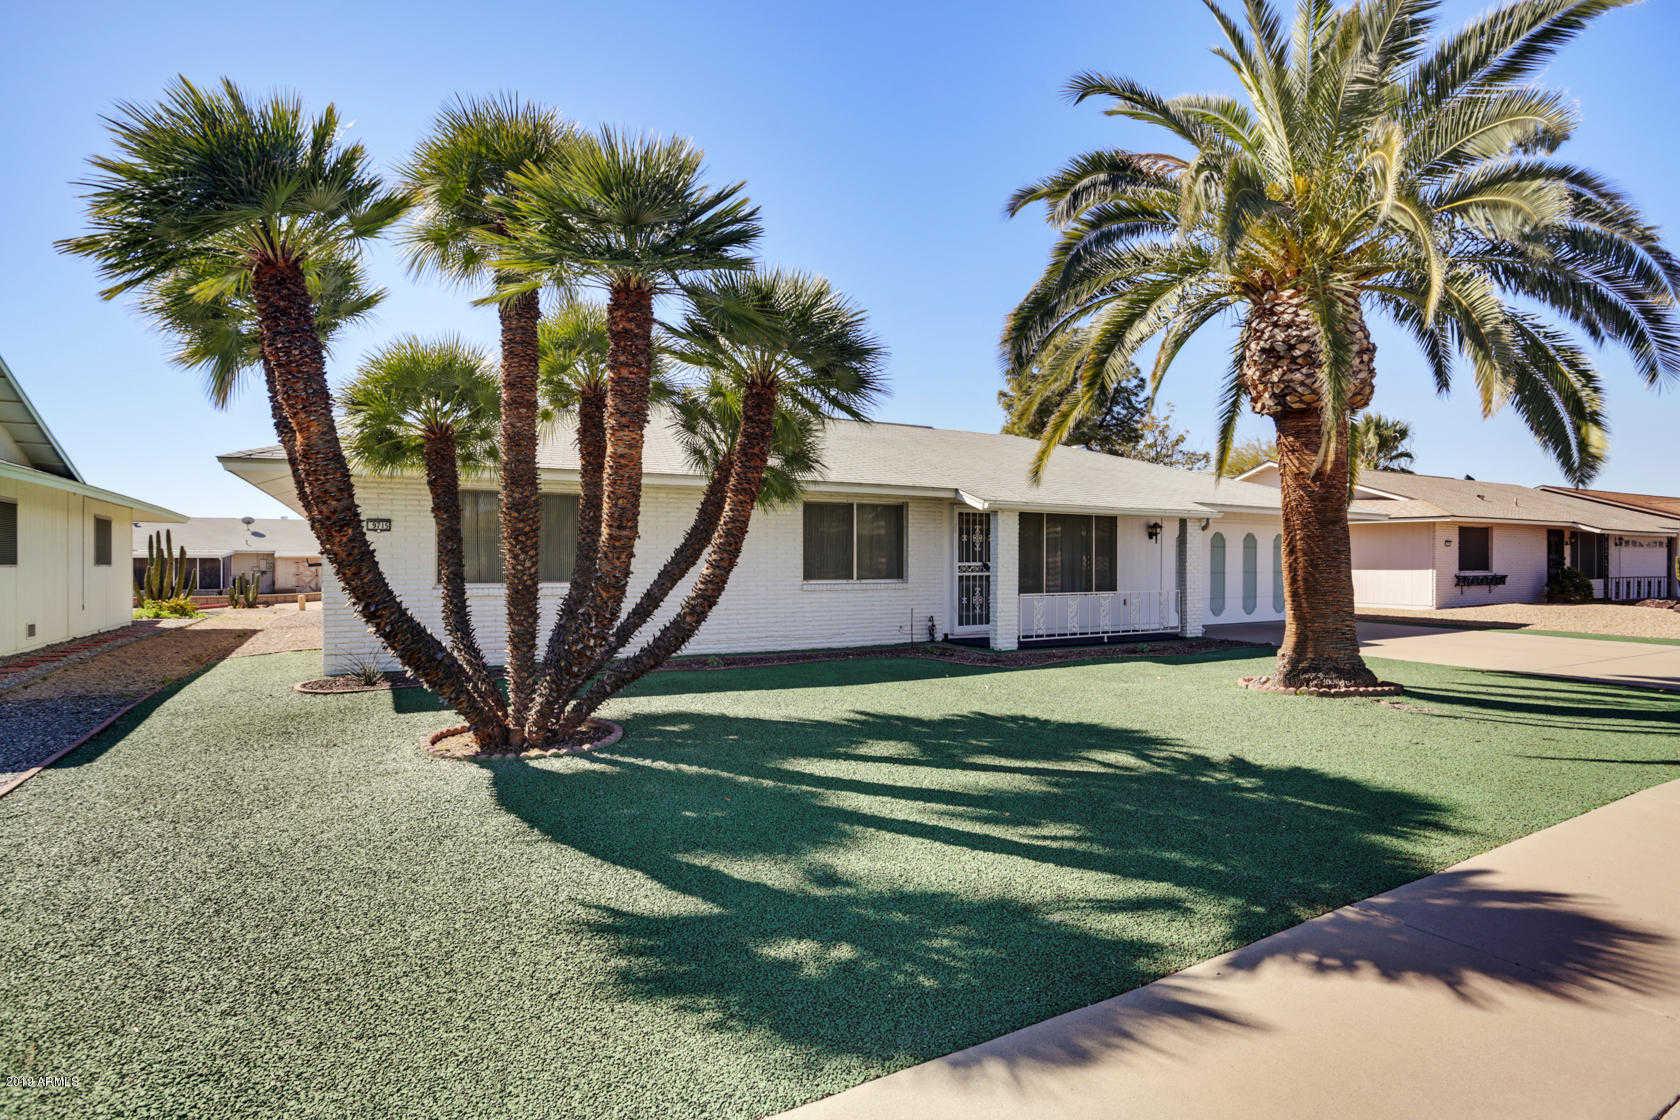 $200,000 - 3Br/2Ba - Home for Sale in Sun City 10 Lt 1-404 Tr A-c, Sun City